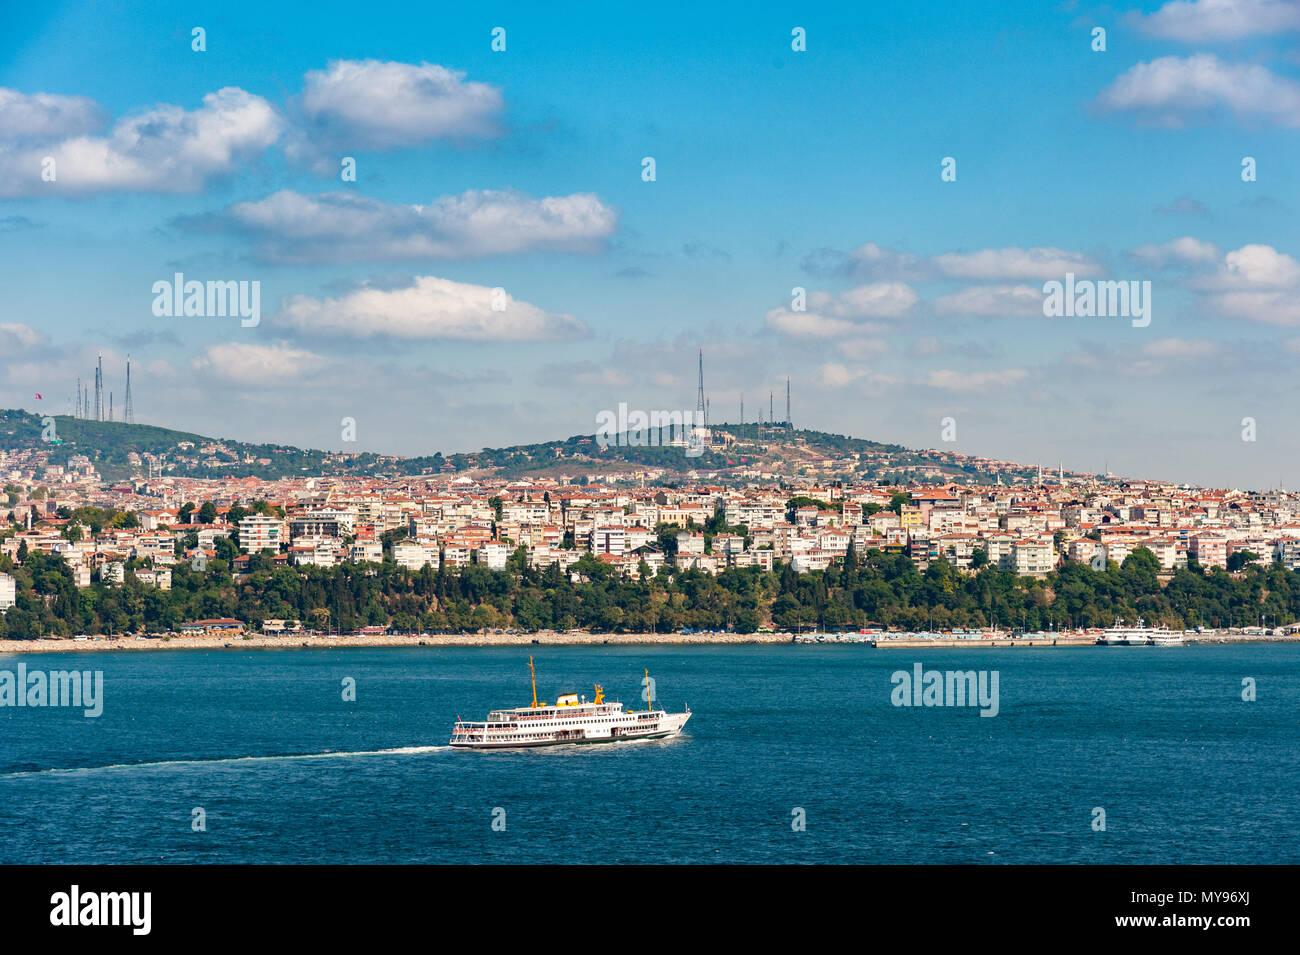 Ferry crossing the Bosphorus, Istanbul, Turkey - Stock Image